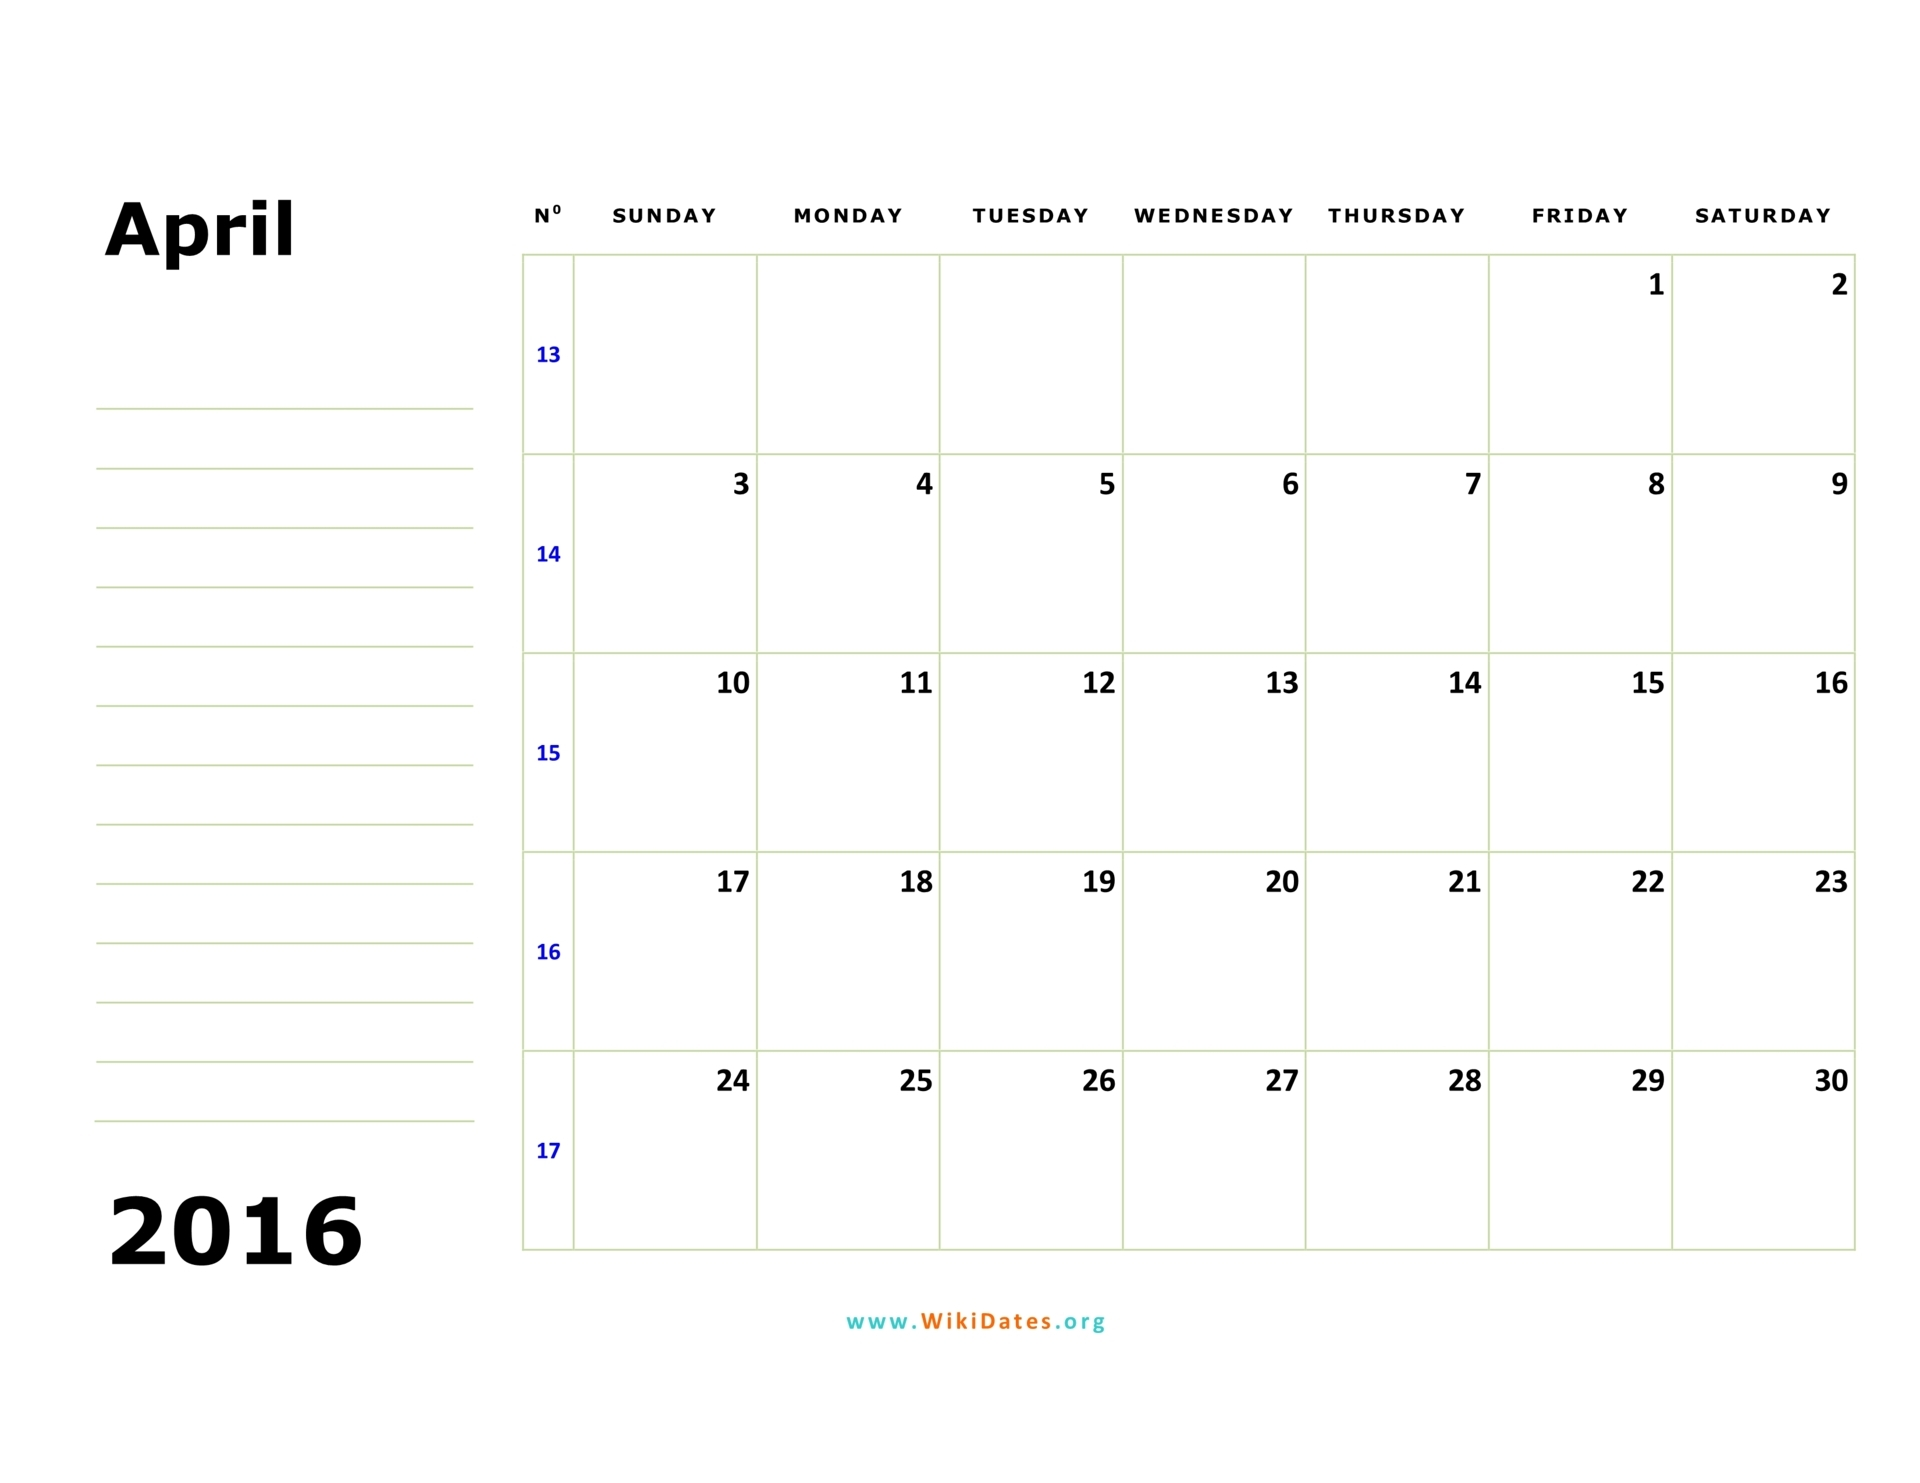 April 2016 Calendar | WikiDates.org